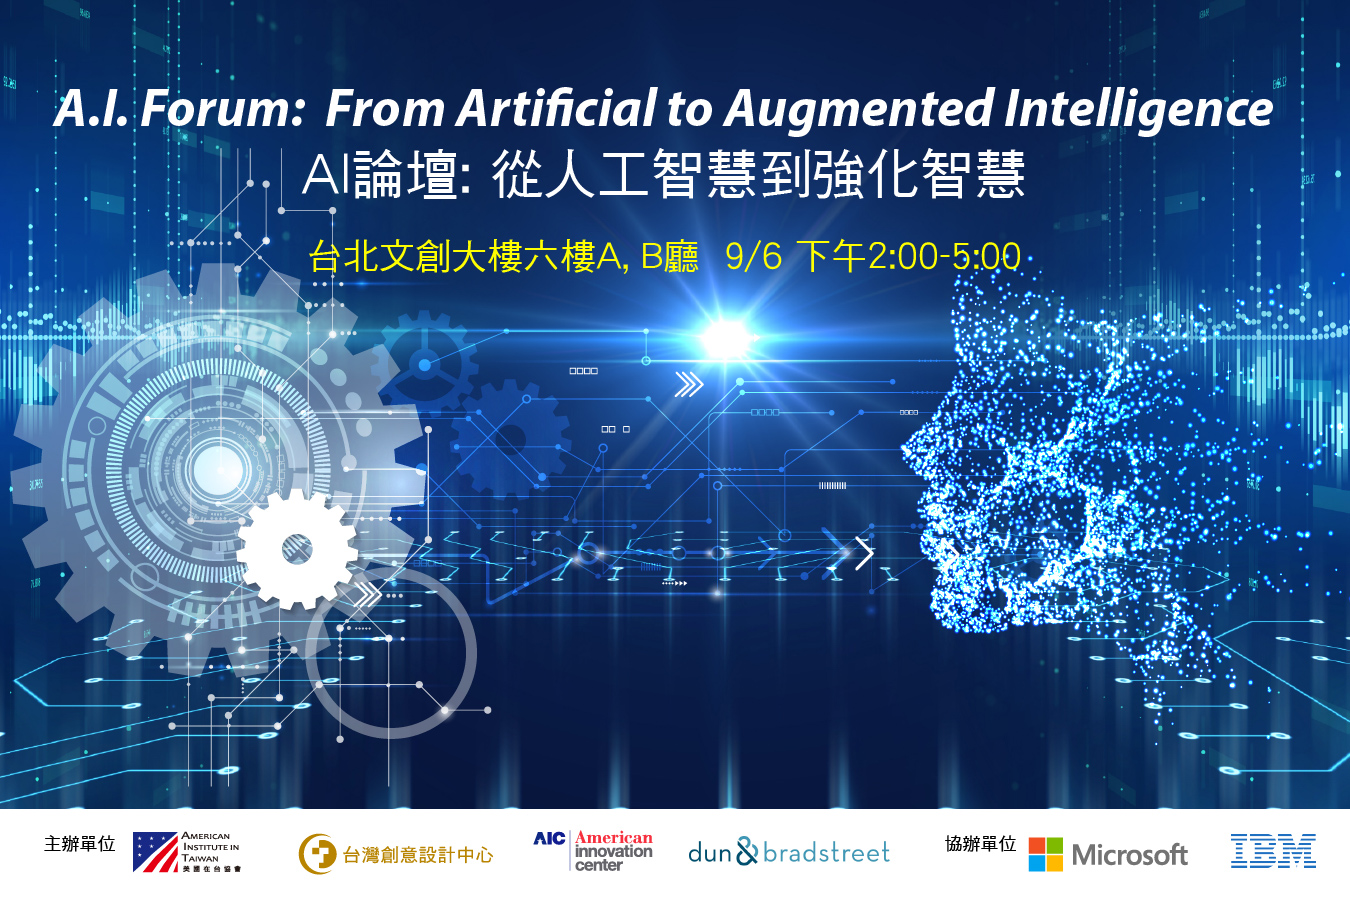 9/6 AIC專題論壇:從人工智慧到強化智慧